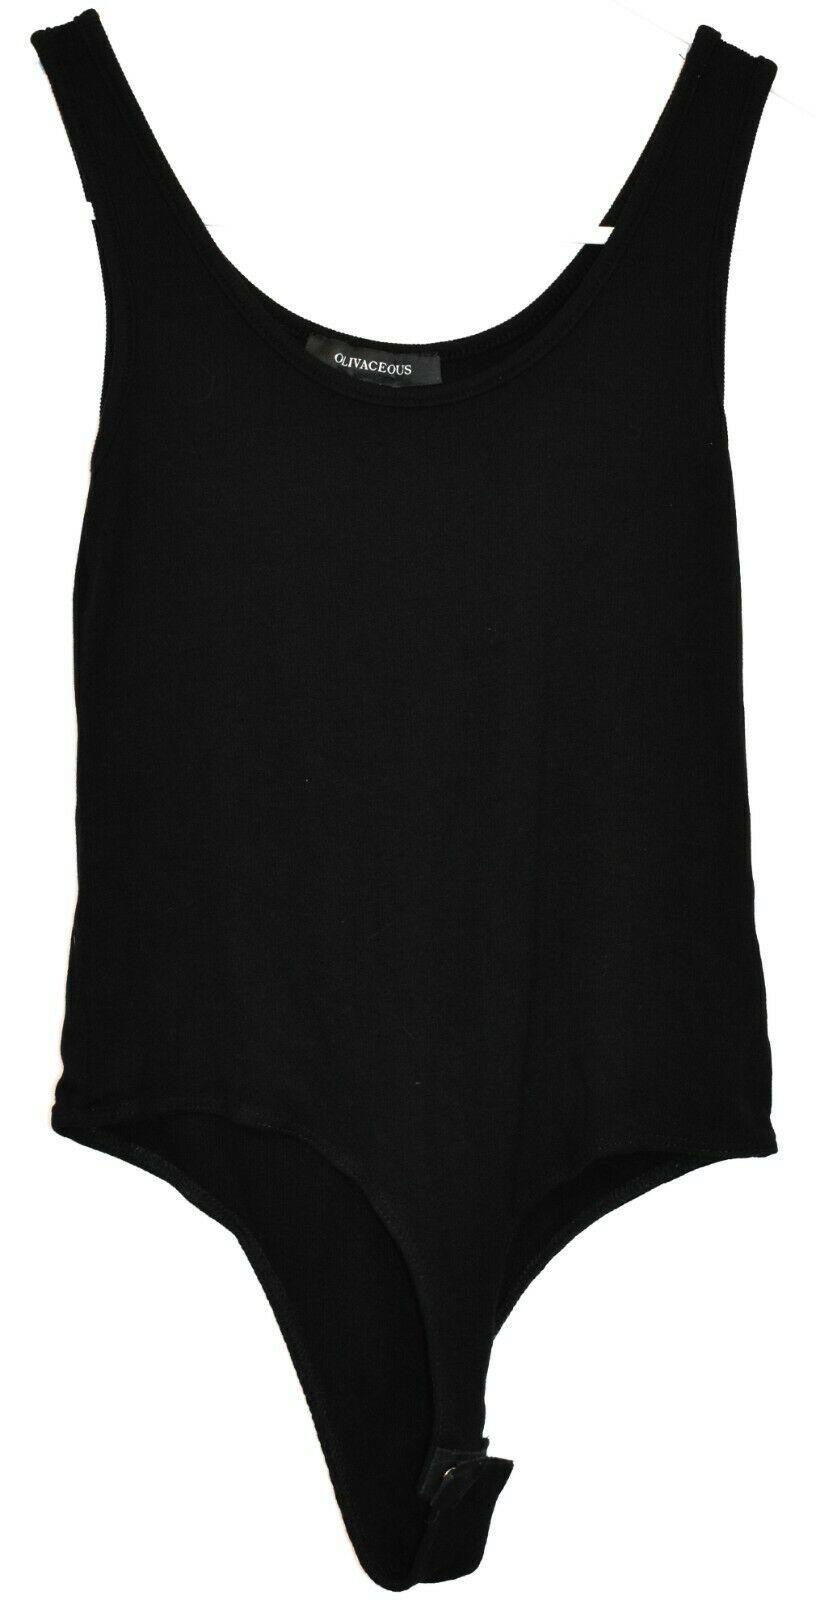 Olivaceous Women's Black Ribbed Knit Tank Top Bodysuit Size S